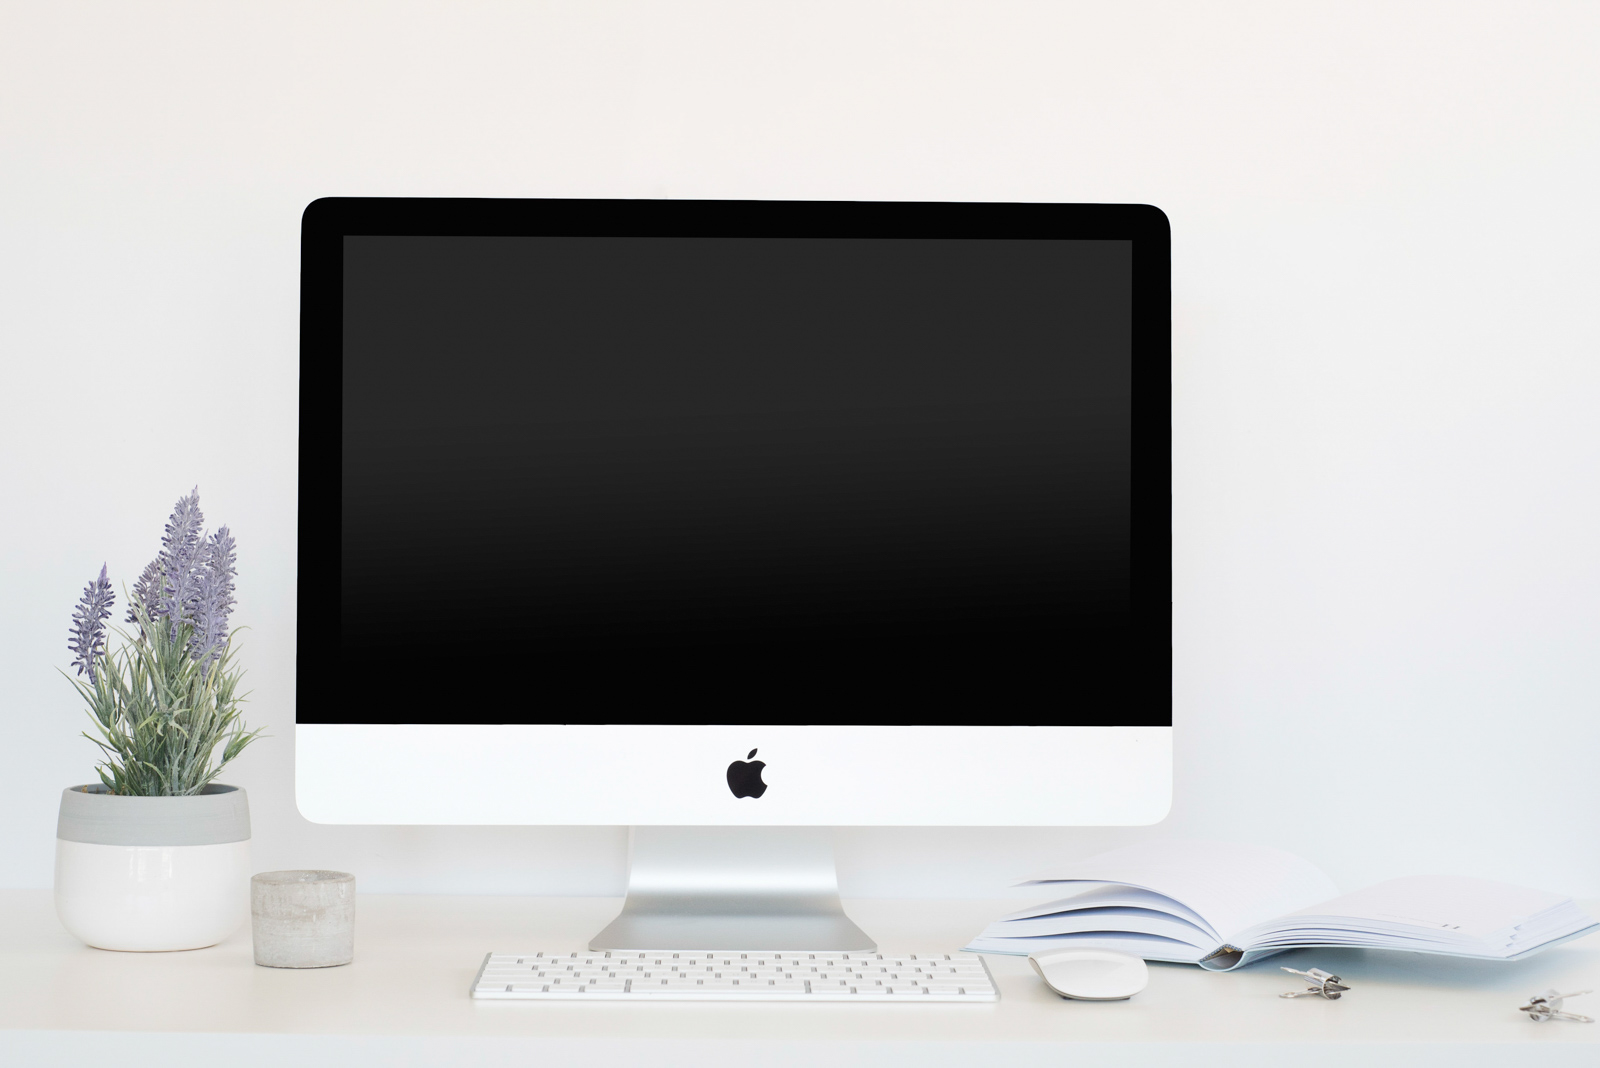 stock photo of iMac on white desk by Jana Bishop